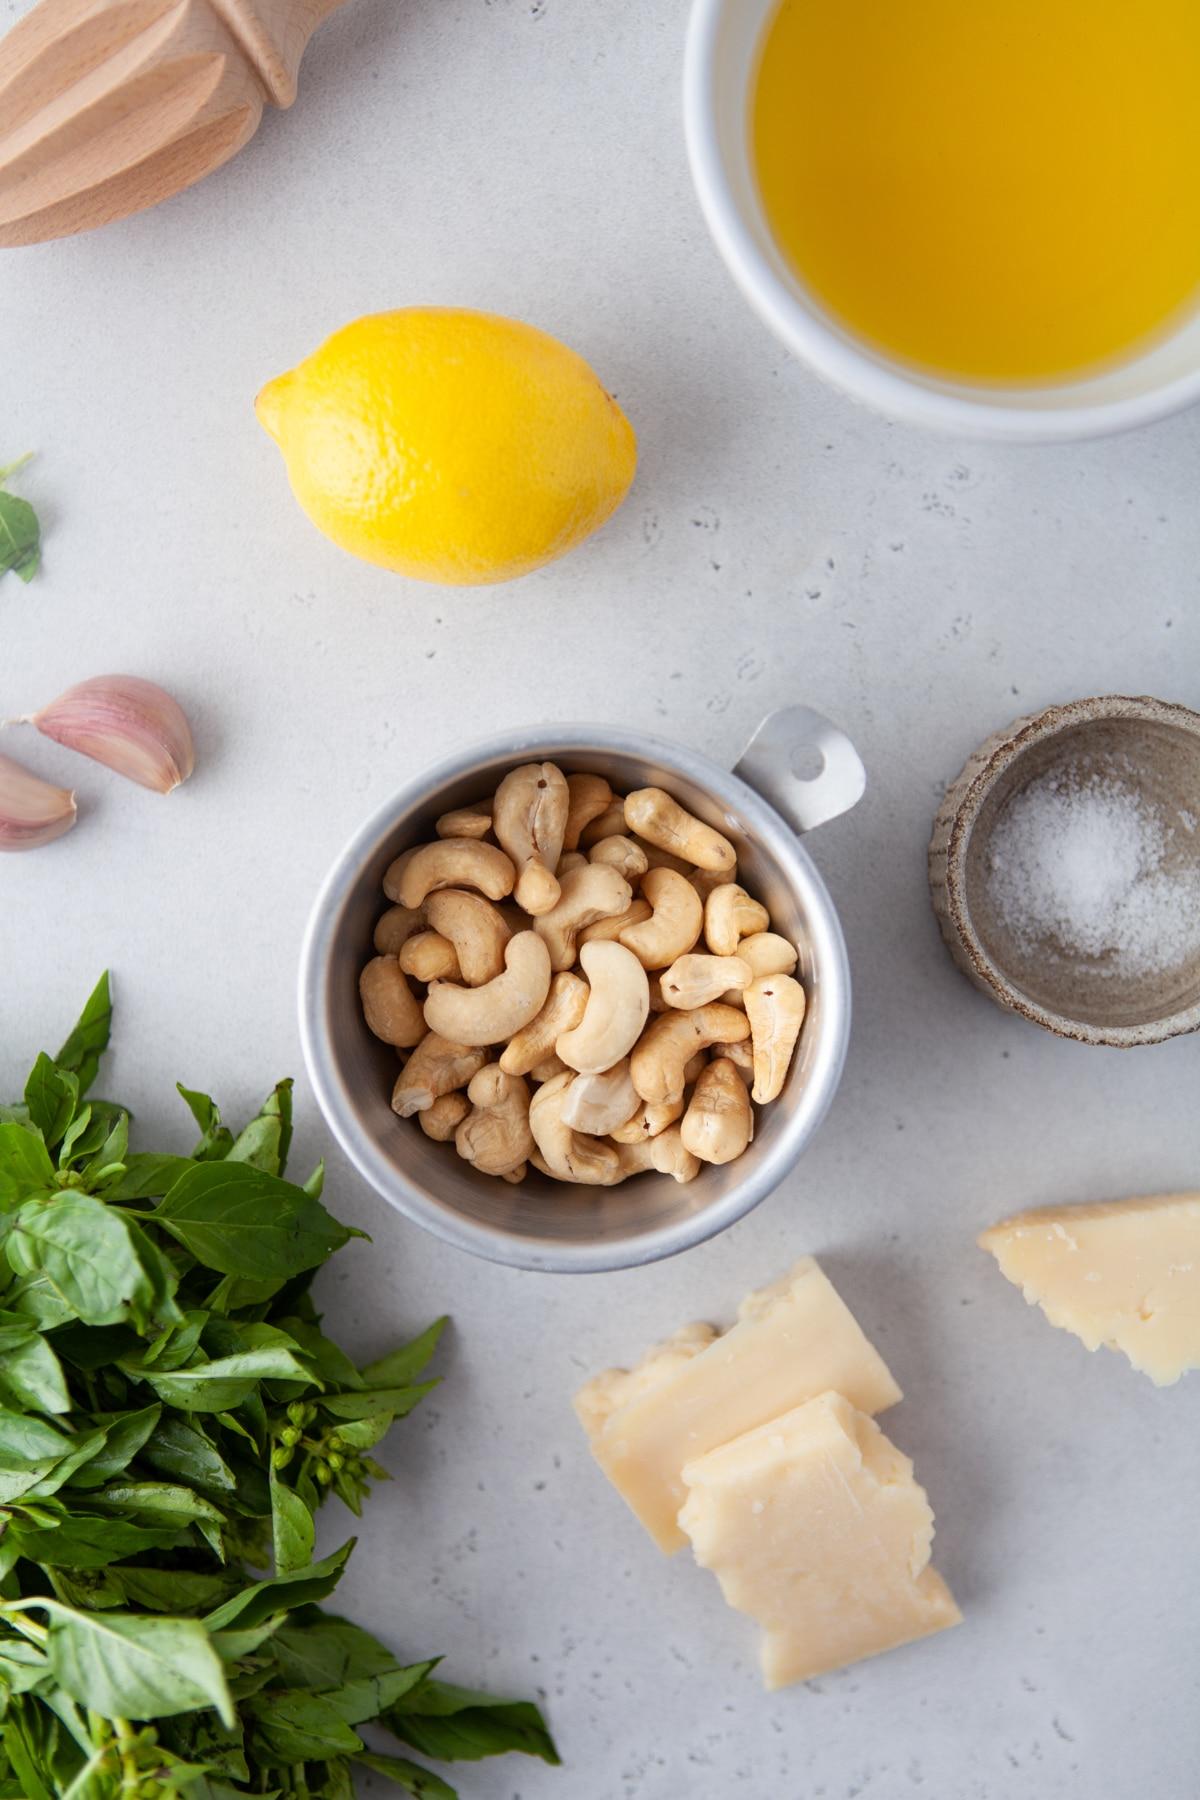 bowl of cashews, fresh basil, lemon, garlic, olive oil, and parmesan cheese